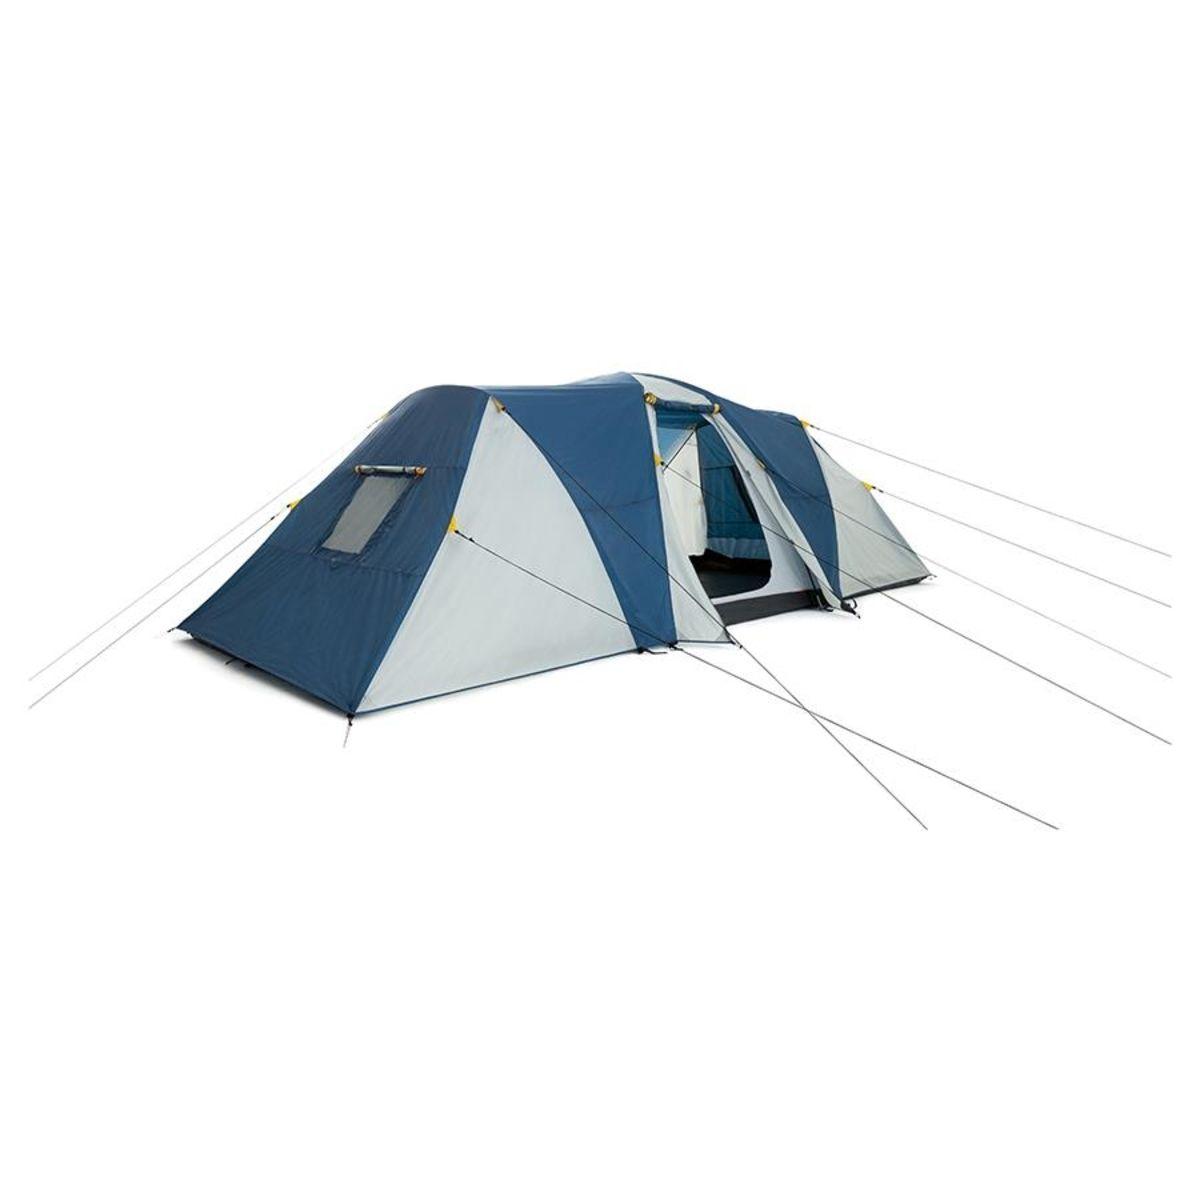 10 Person 3 Rm Dome Tent active u0026 Co | Kmart Australia  sc 1 st  Pinterest & 10 Person 3 Rm Dome Tent active u0026 Co | Kmart Australia | Camping ...